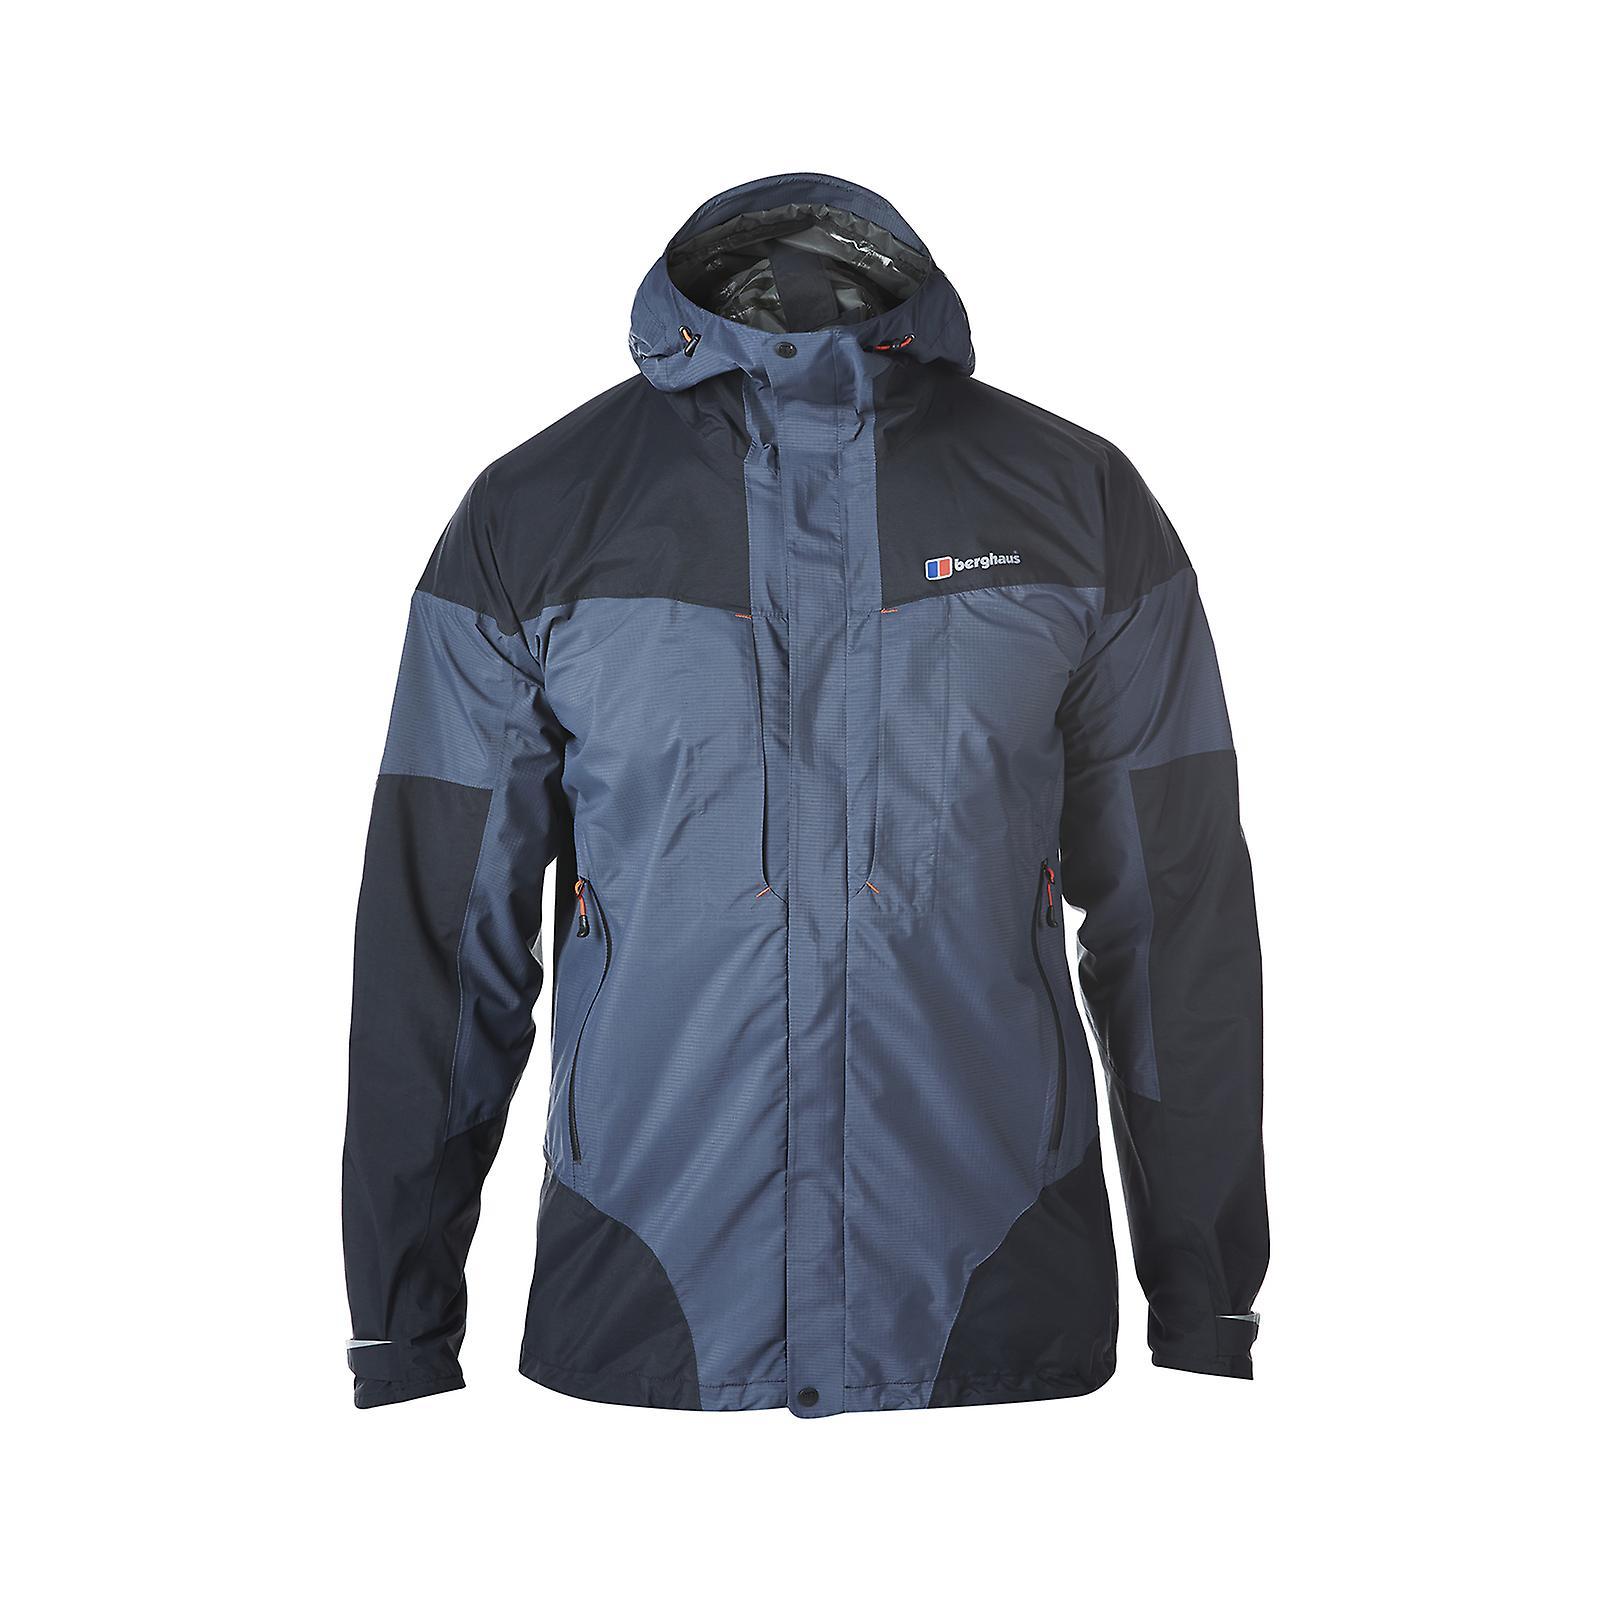 free shipping 7201e 5f62d Berghaus Mens Light Trek Hydroshell Waterproof Jacket